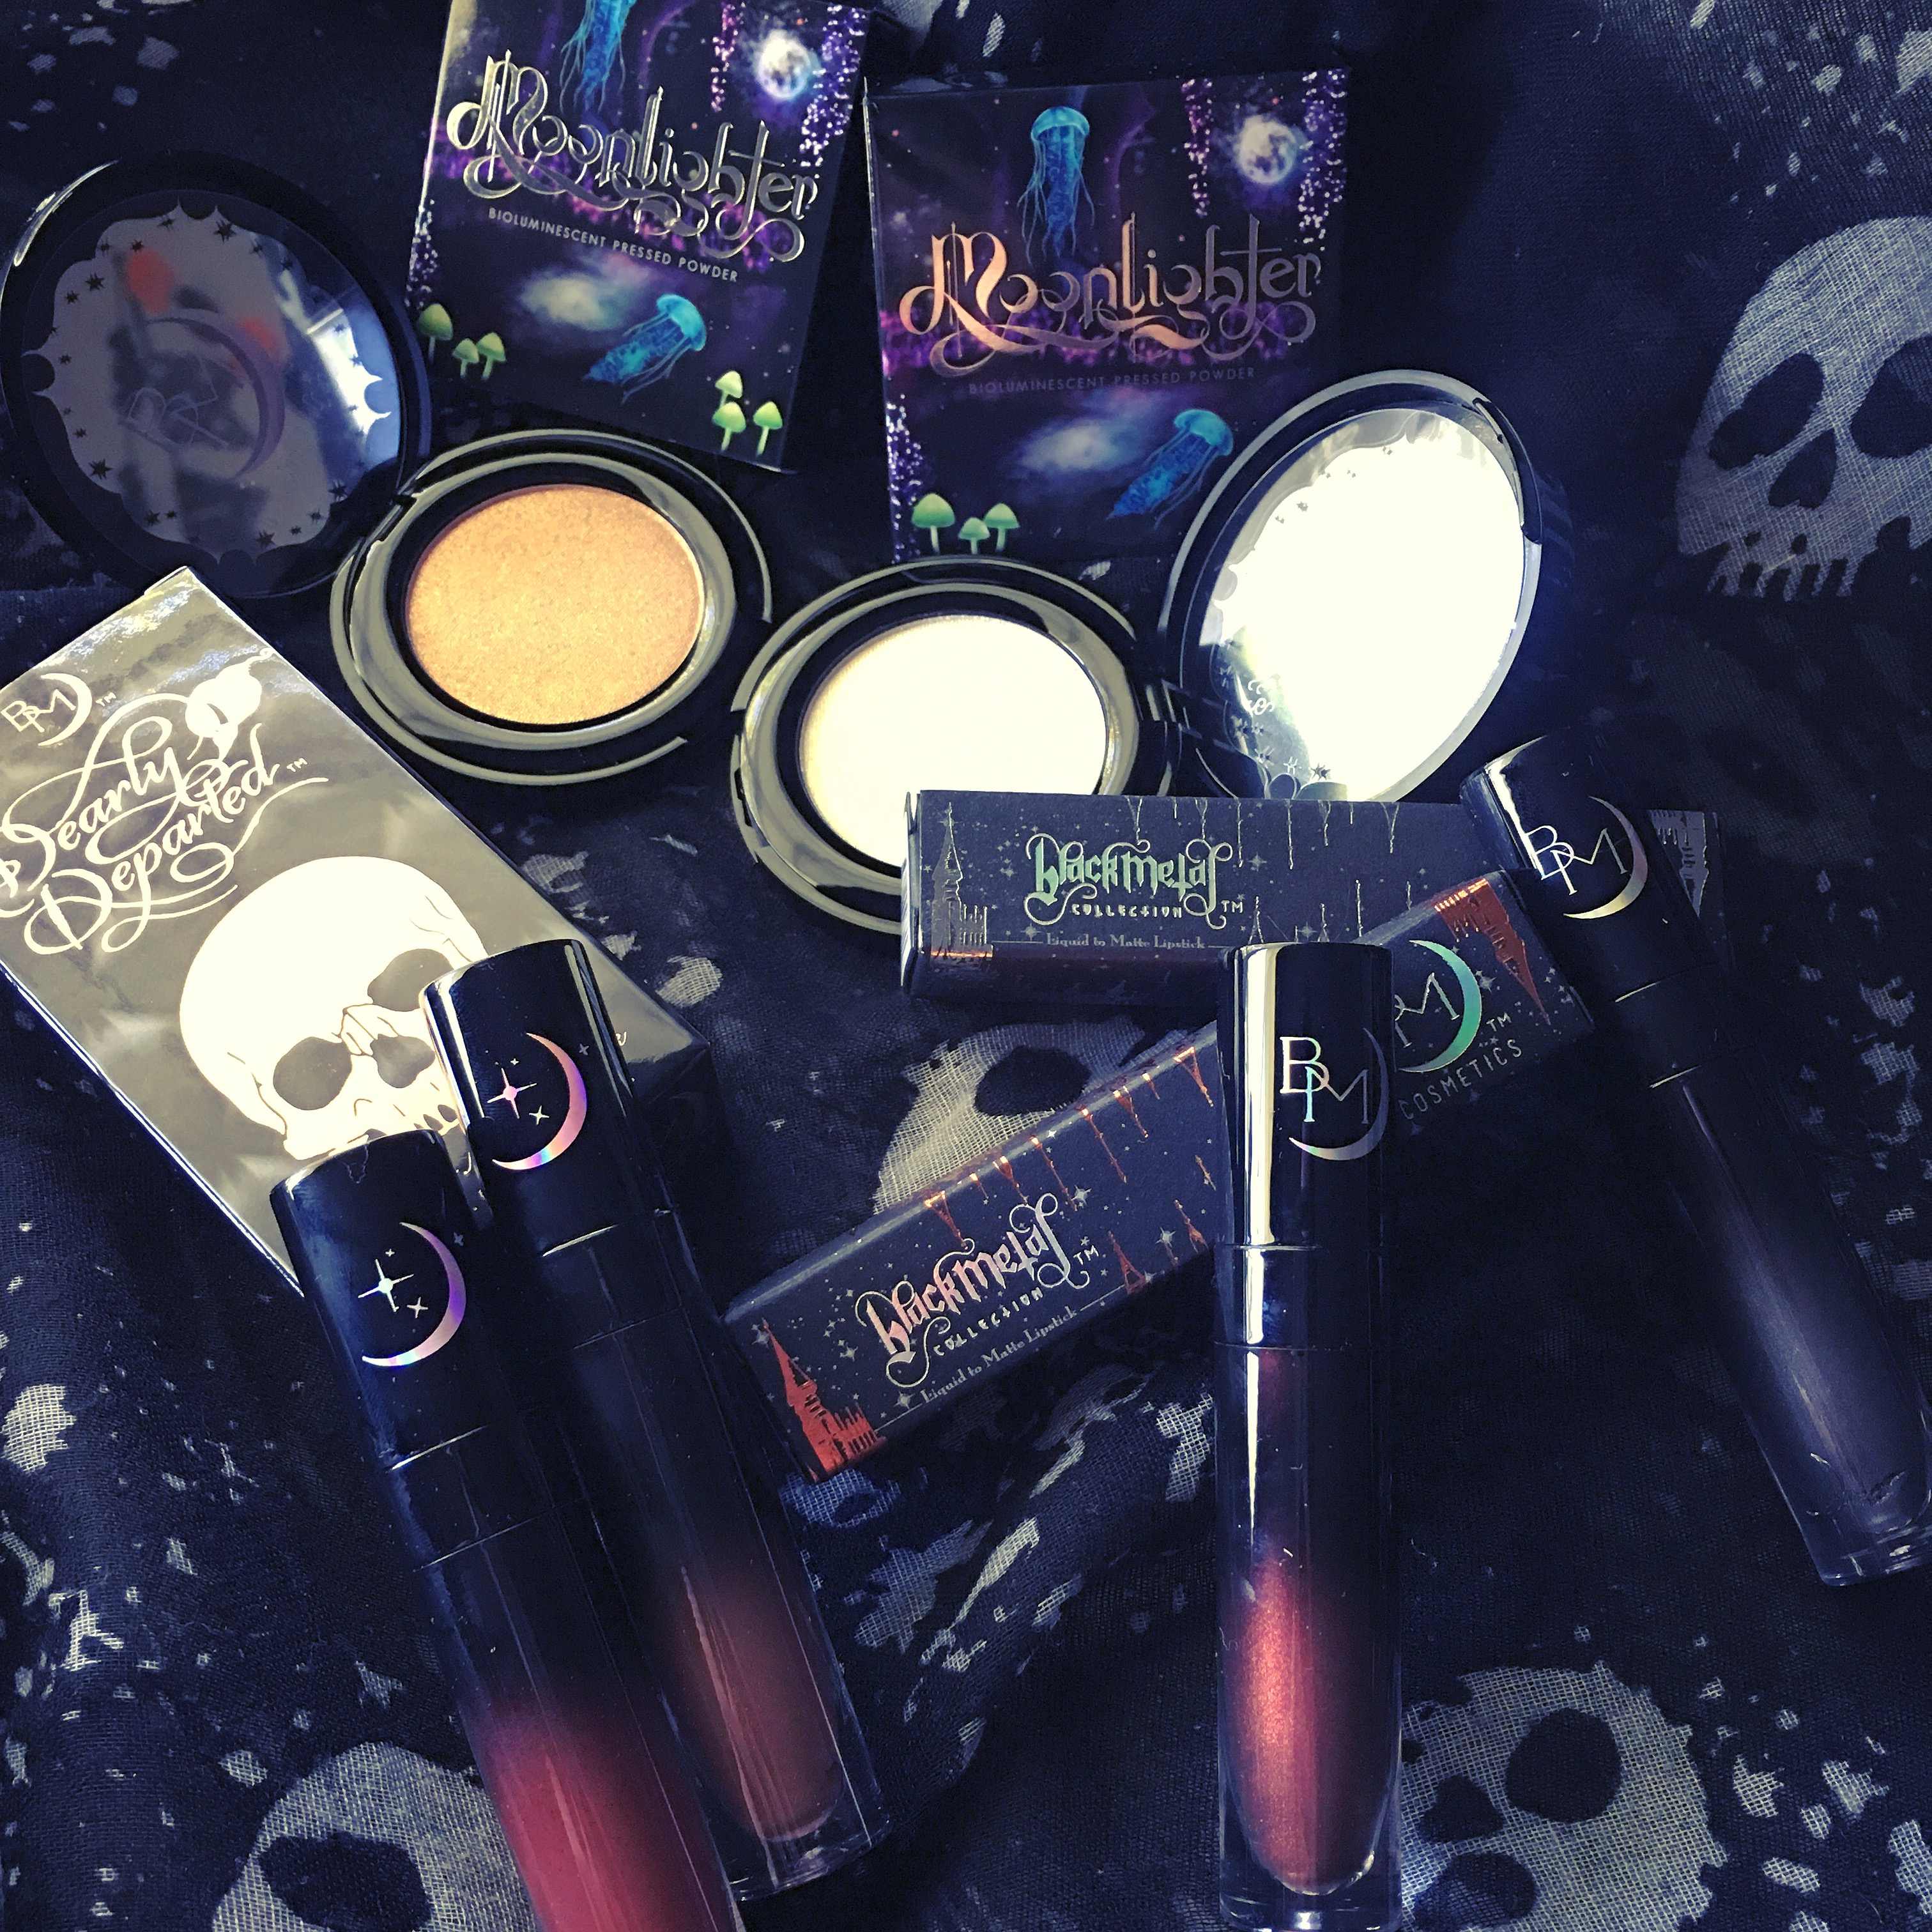 6 Black Moon Cosmetics highlighters and lipsticks